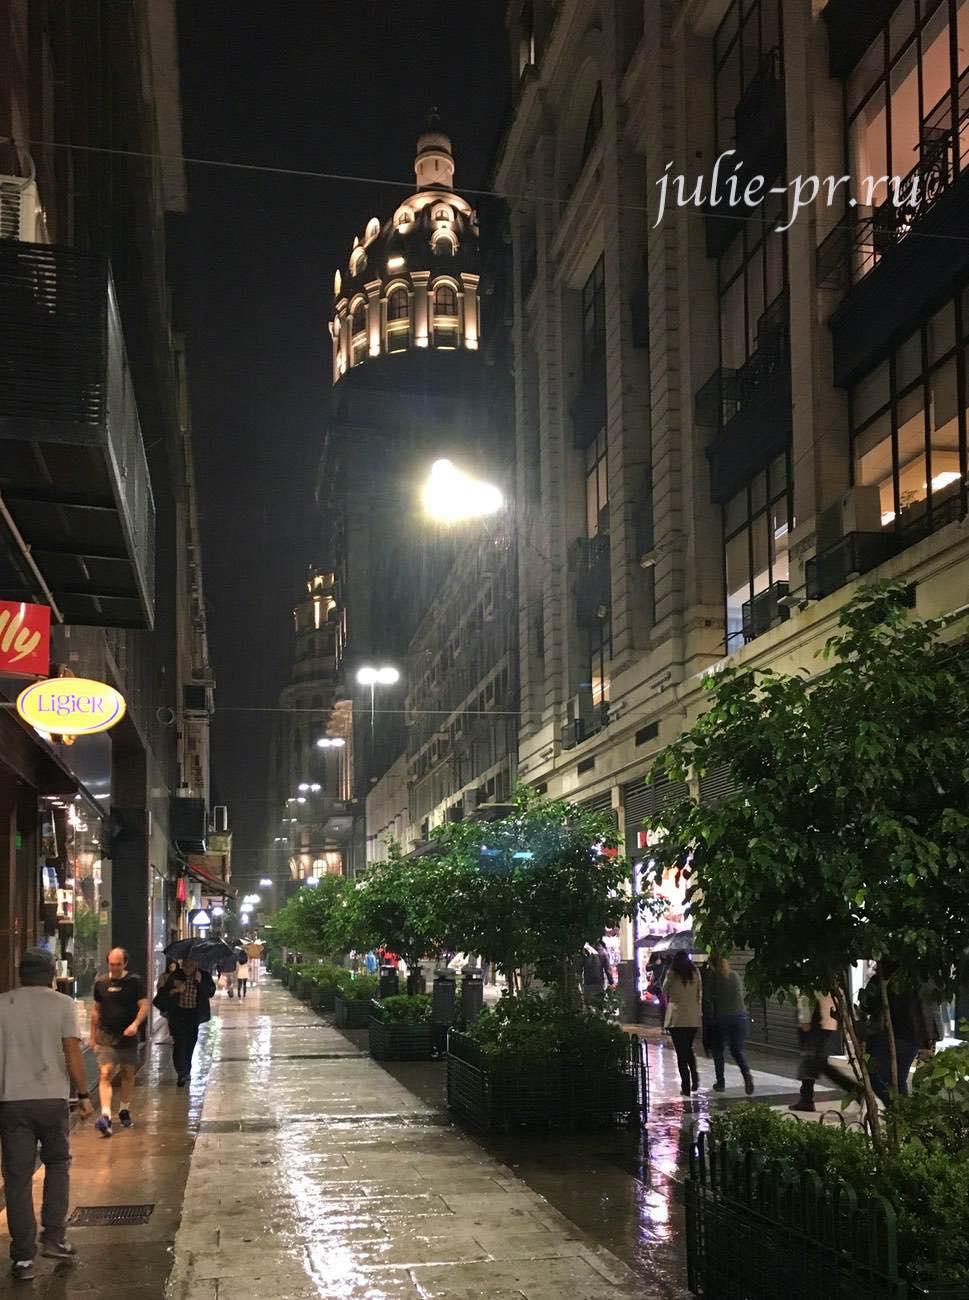 Аргентина, Буэнос-Айрес, вечер